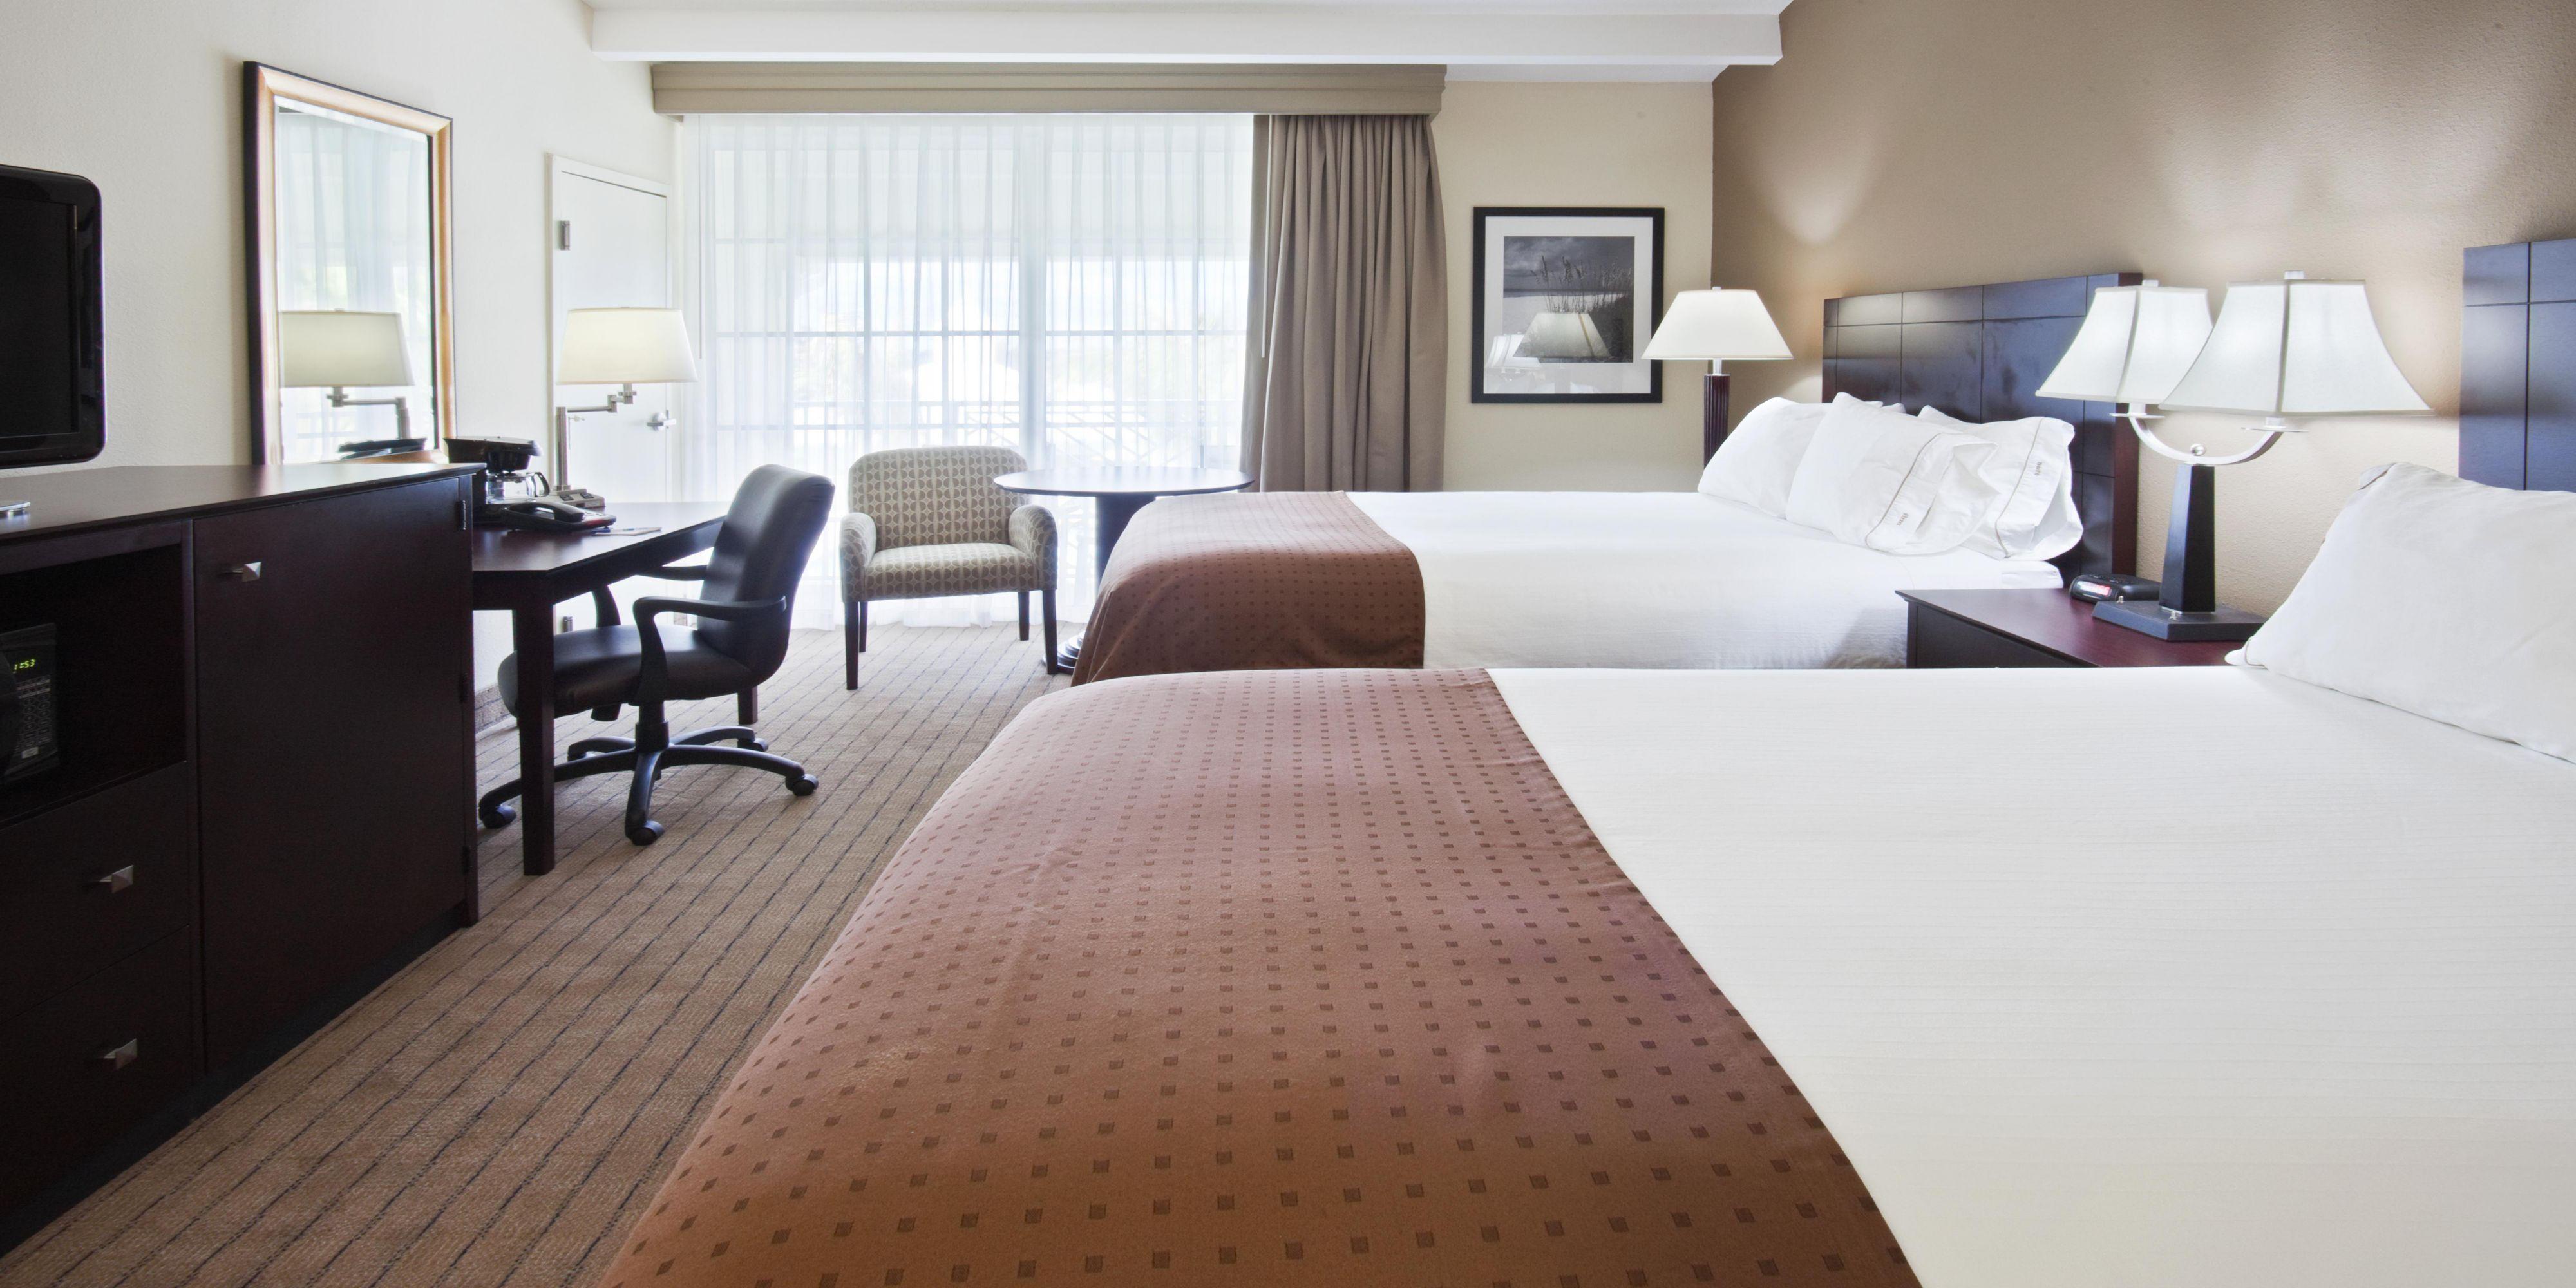 Holiday Inn Express Juno Beach 4295258255 2x1